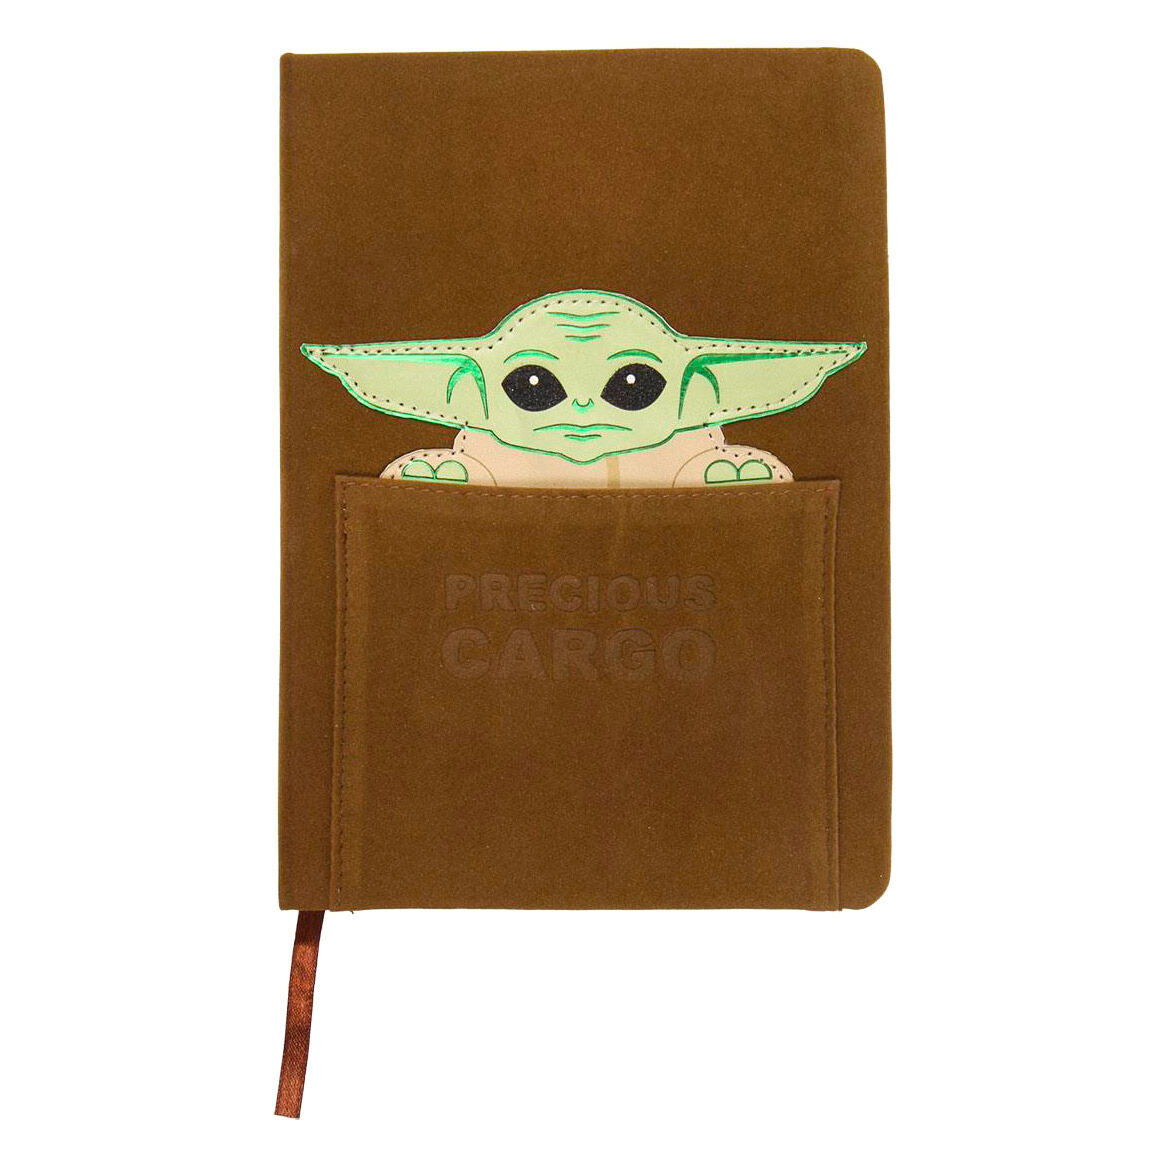 Cuaderno A5 polipiel Yoda Child The Mandalorian Star Wars